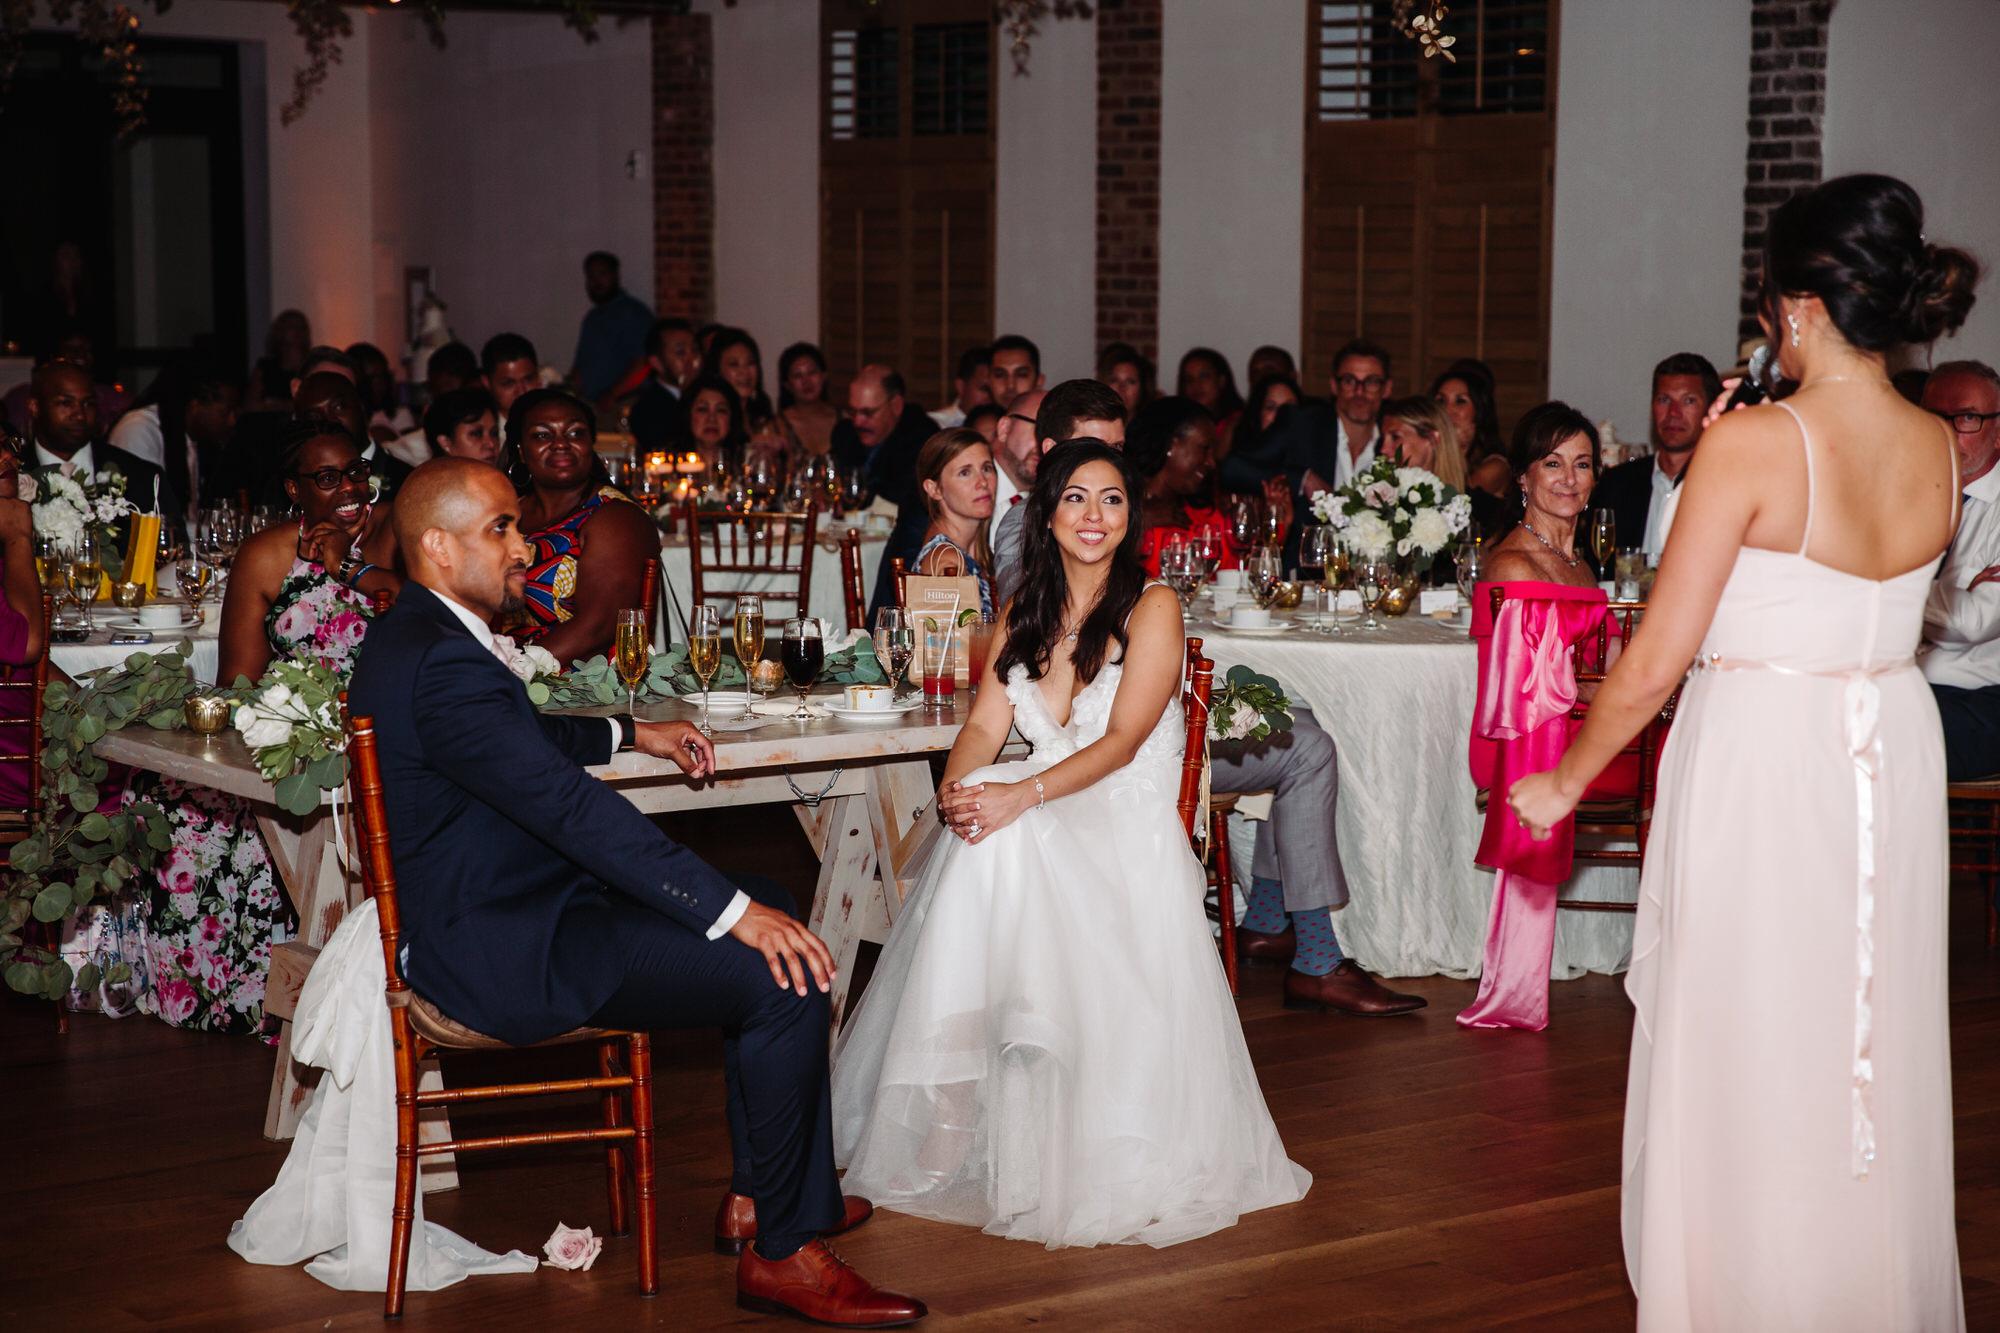 st-lukes-chapel-cannon-green-charleston-wedding-1014.JPG